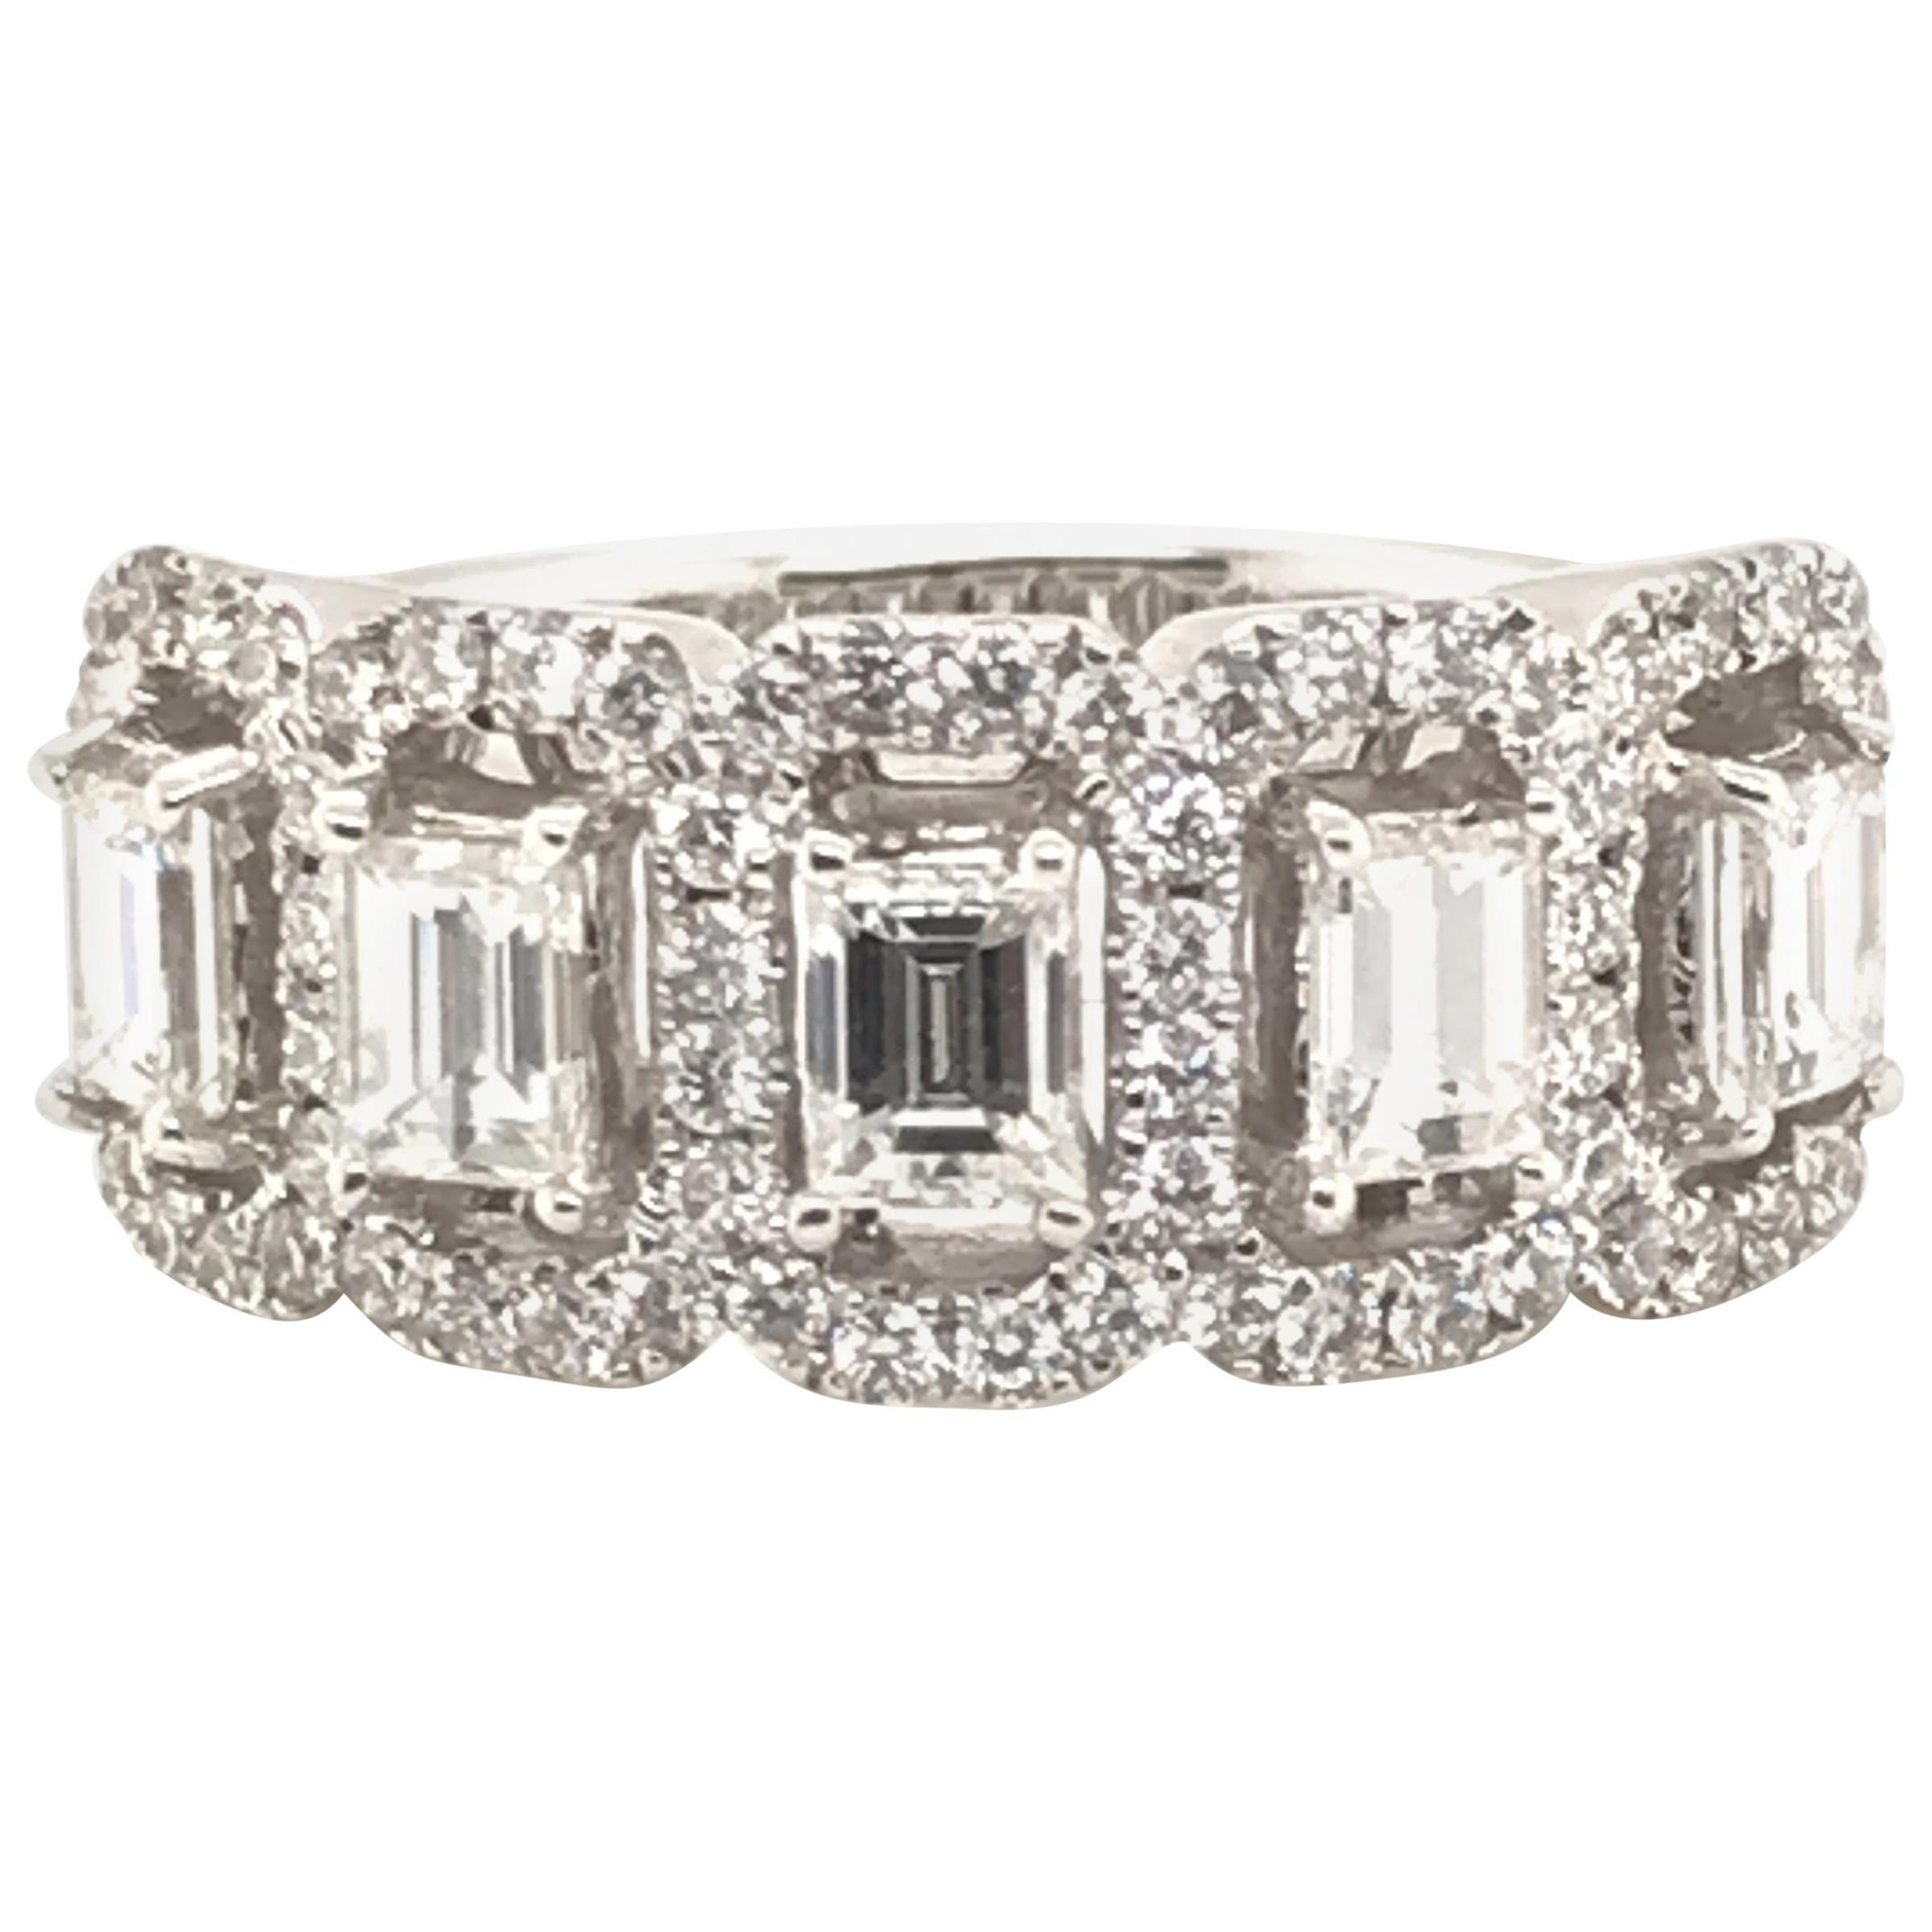 1.50 Carat Emerald Cut and Round Diamond Ring